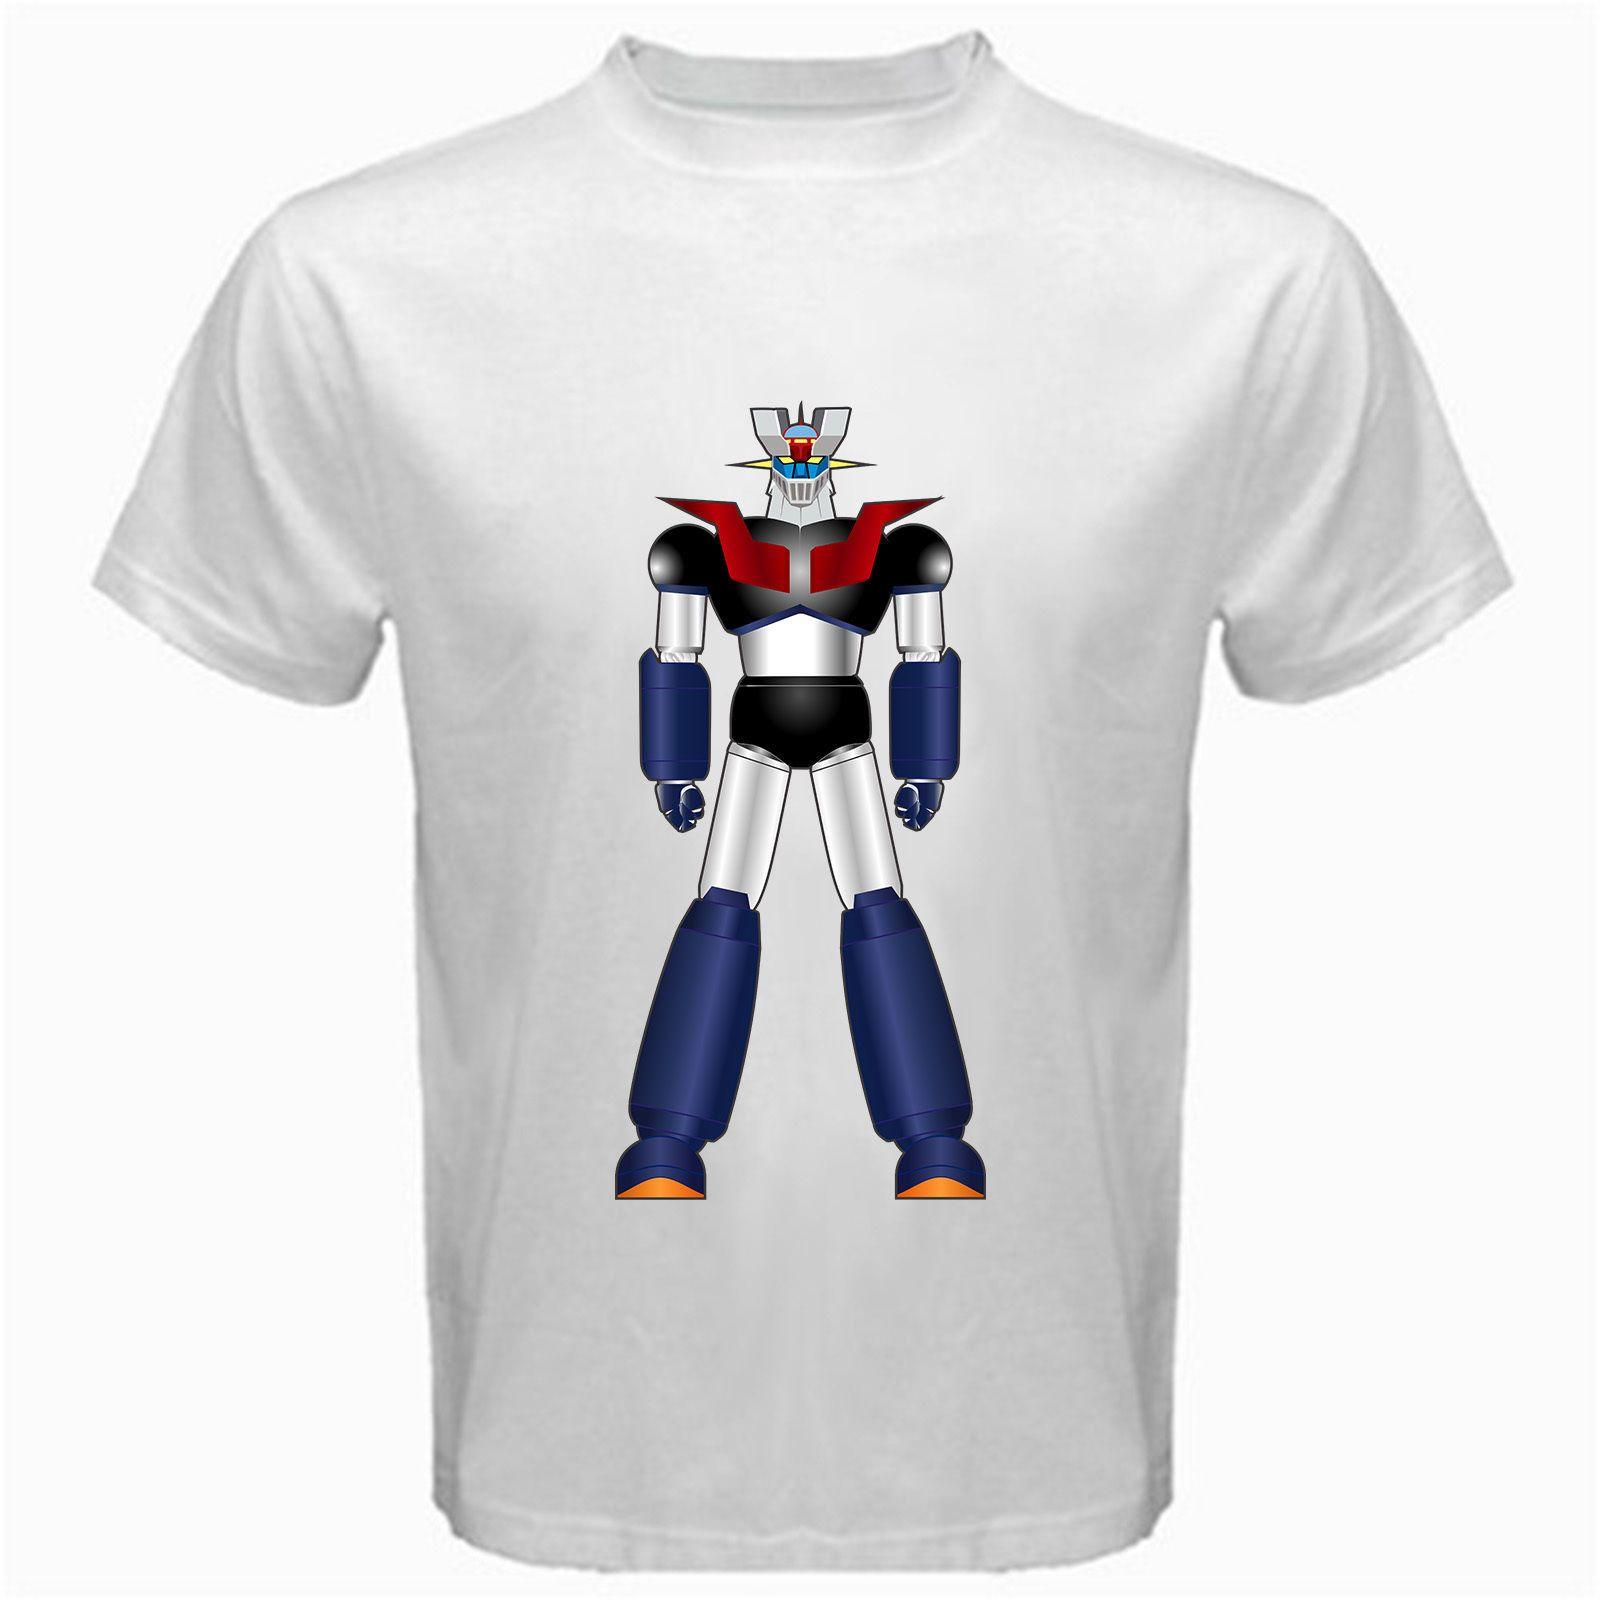 Mazinger M7 T Movie Anime Shin Shirt Z Manga Classico Robot Acquista b7g6yYf